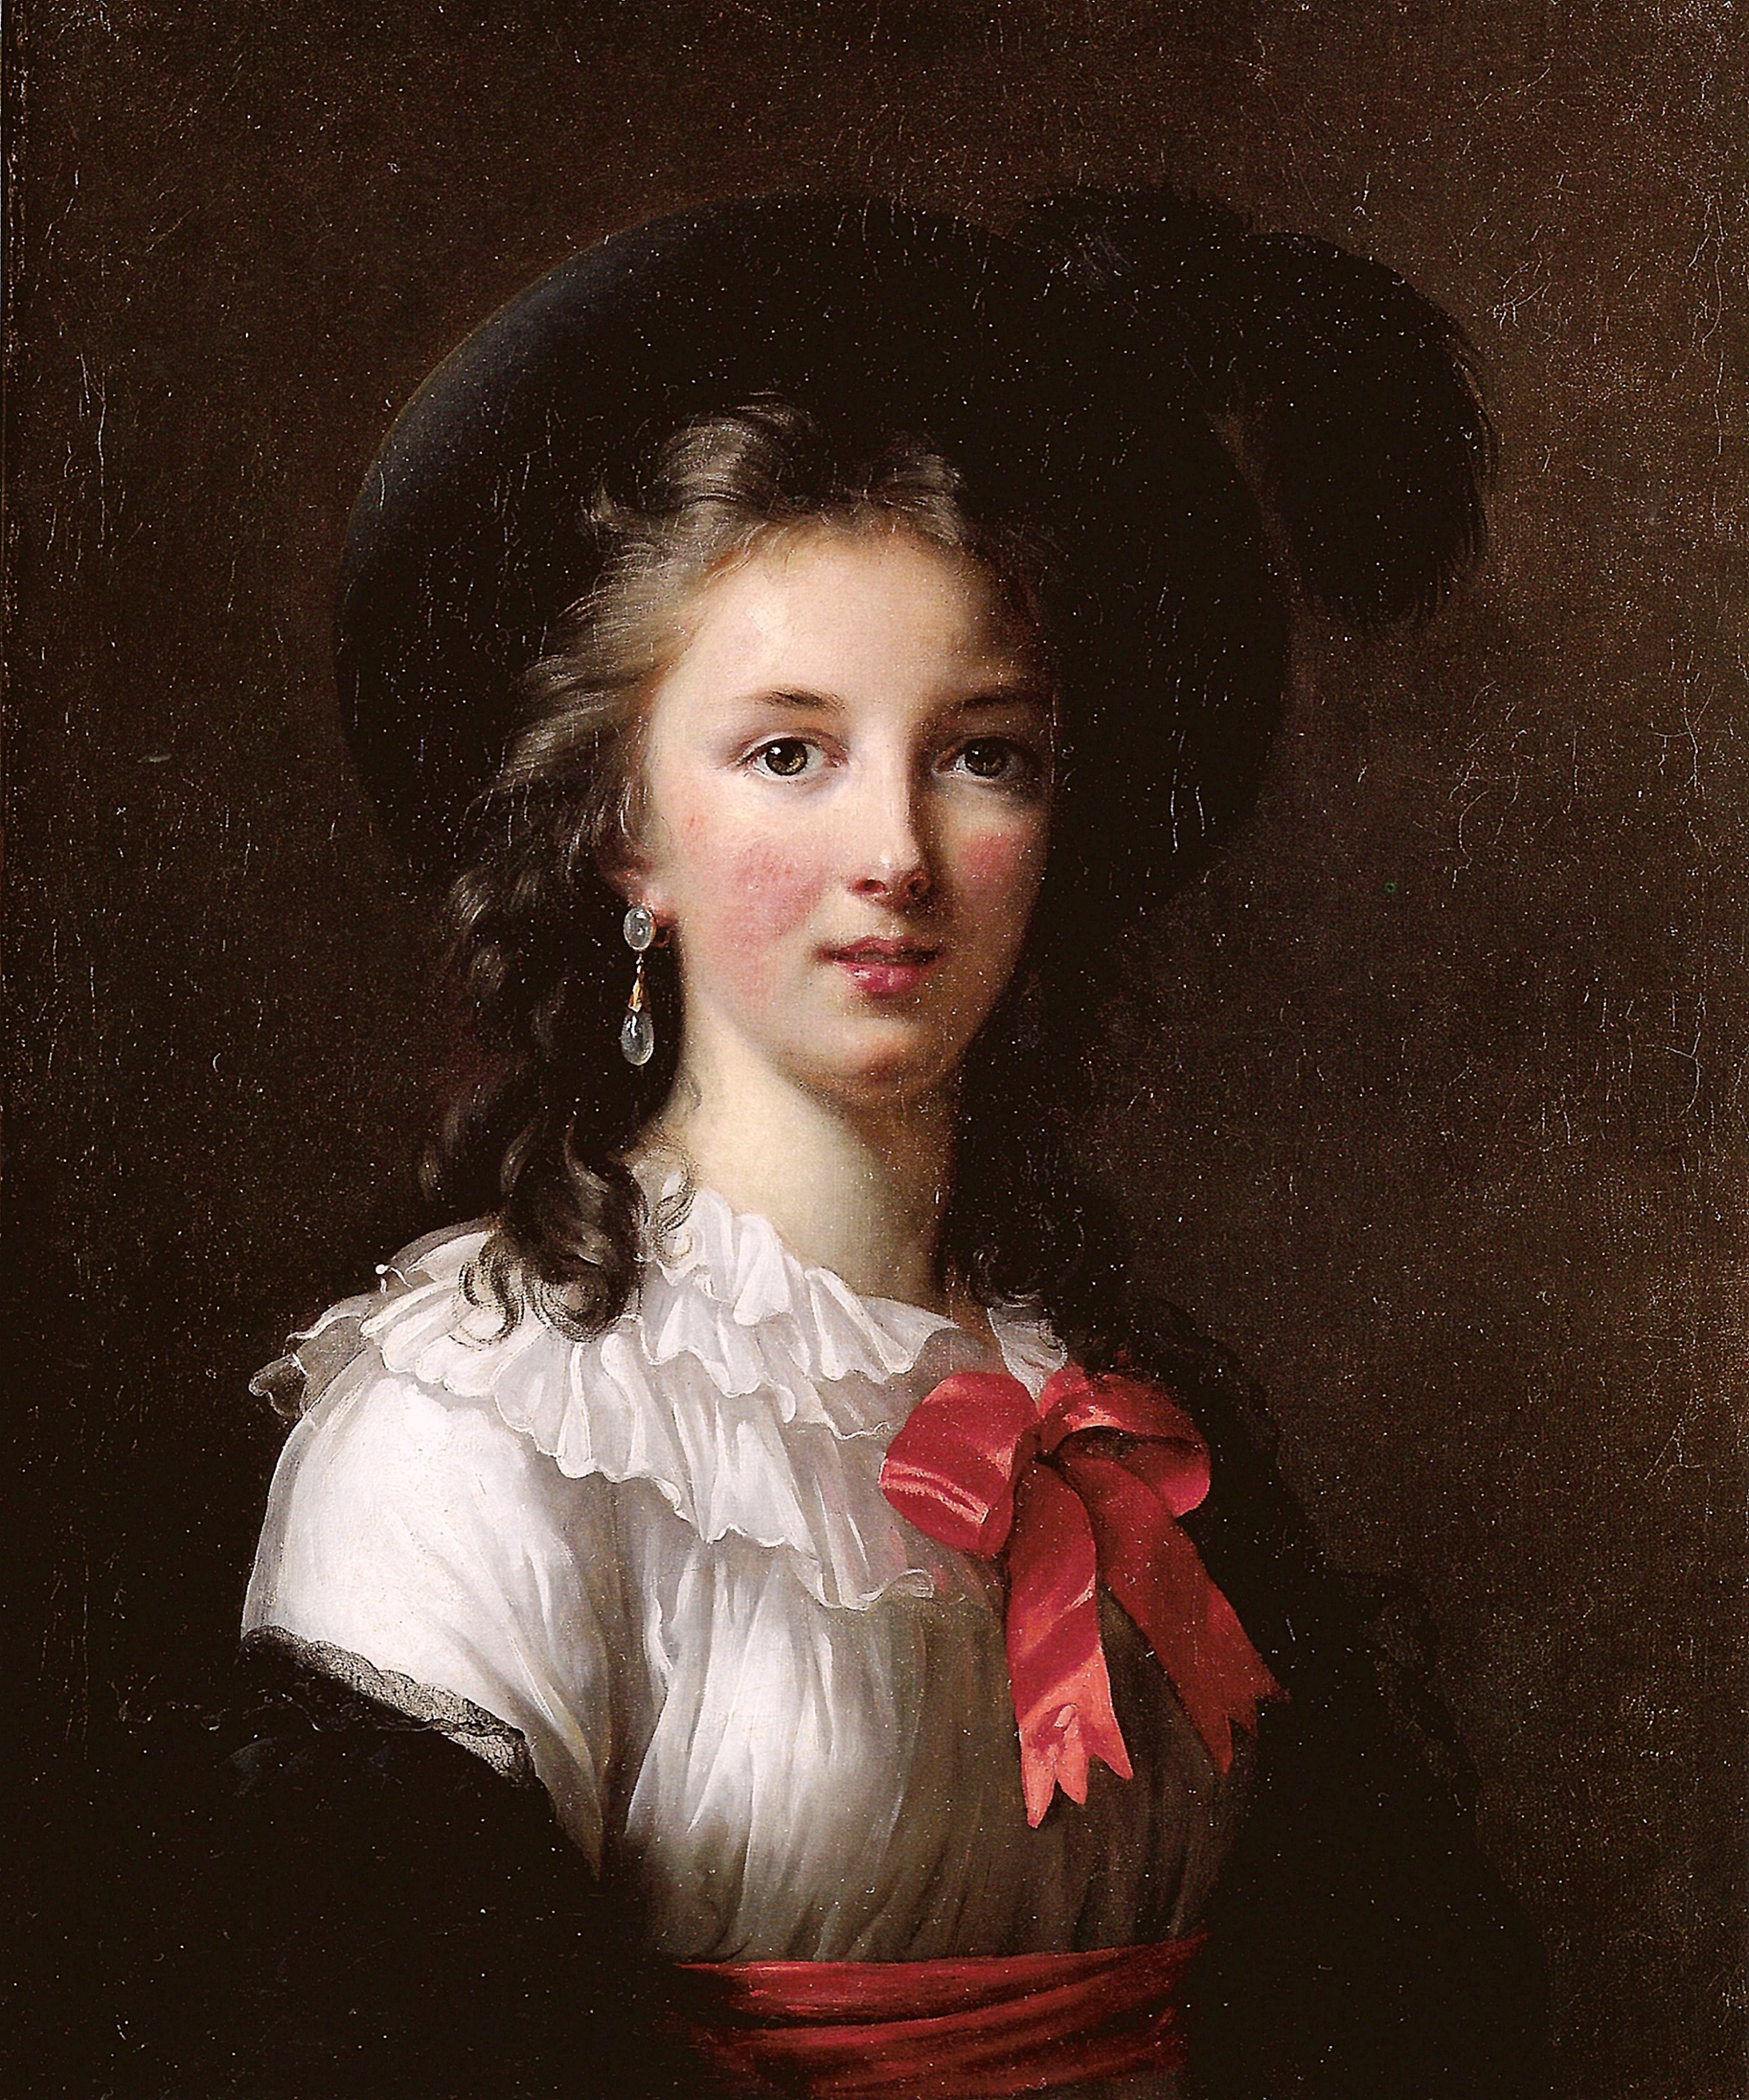 http://uploads1.wikipaintings.org/images/louise-elisabeth-vigee-le-brun/self-portrait-1781.jpg